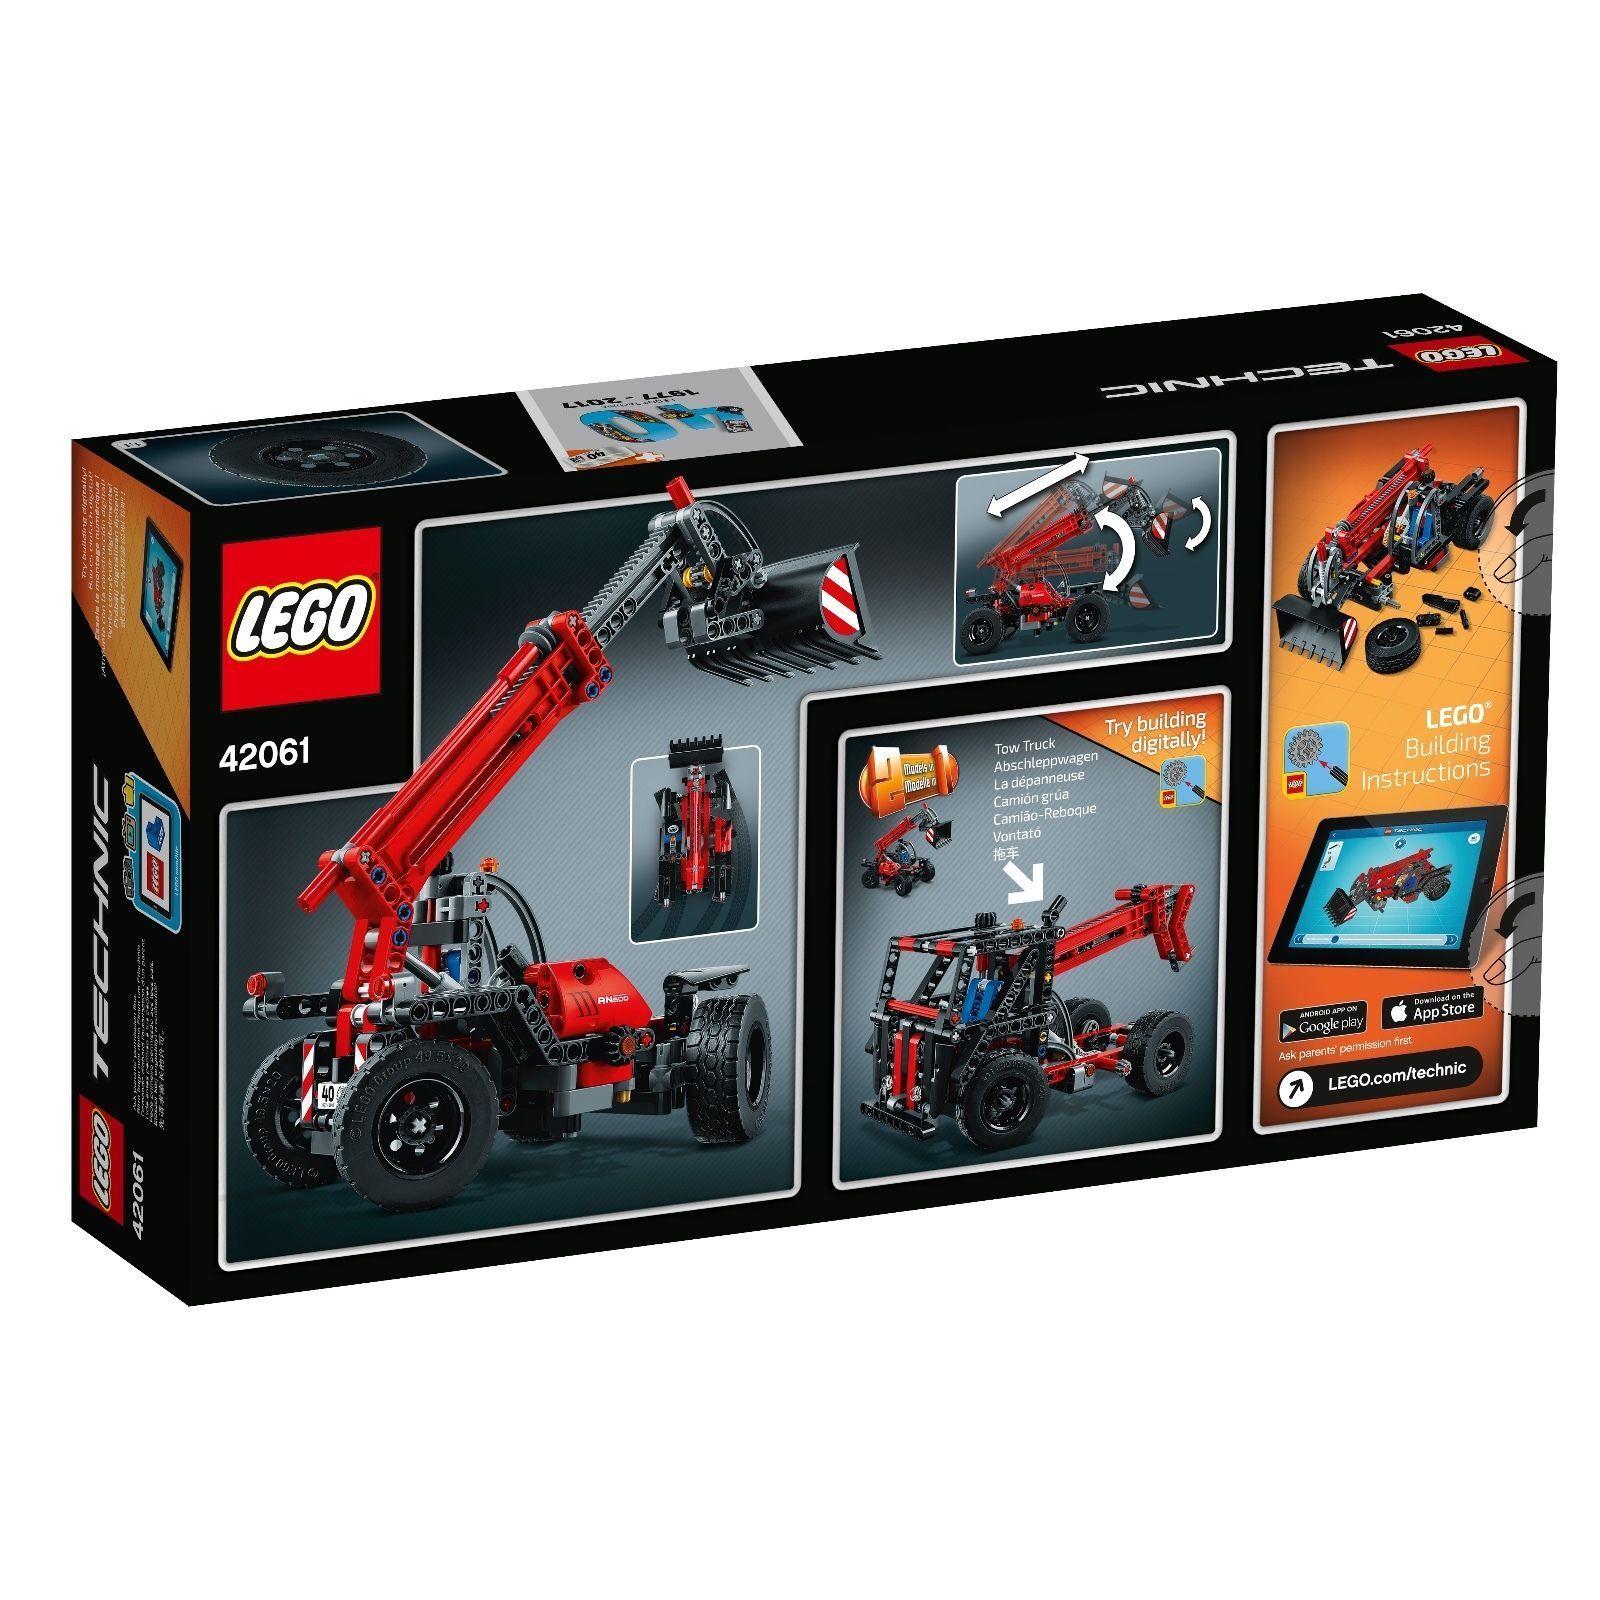 Lego Technic Technic Technic 42061 Teleskoplader Neu Ovp